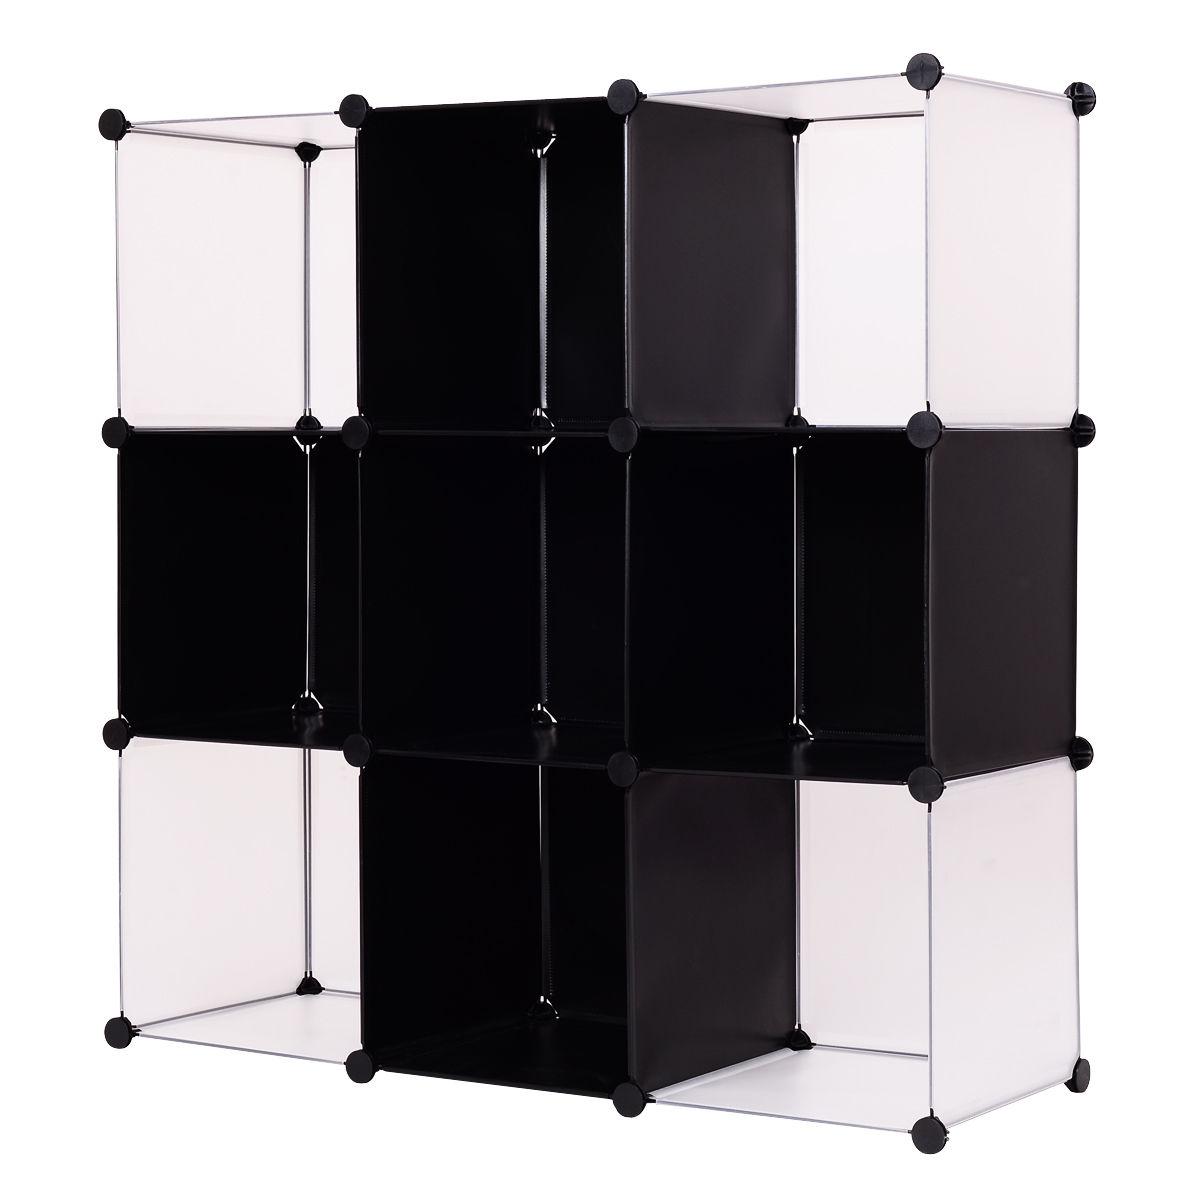 Us 28 99 Giantex 3 Tier 9 Cubic Bookcase Living Room Storage Cabinet Shelf Modern Diy Closet Organizer Office Home Furniture Hw54798 On Aliexpress